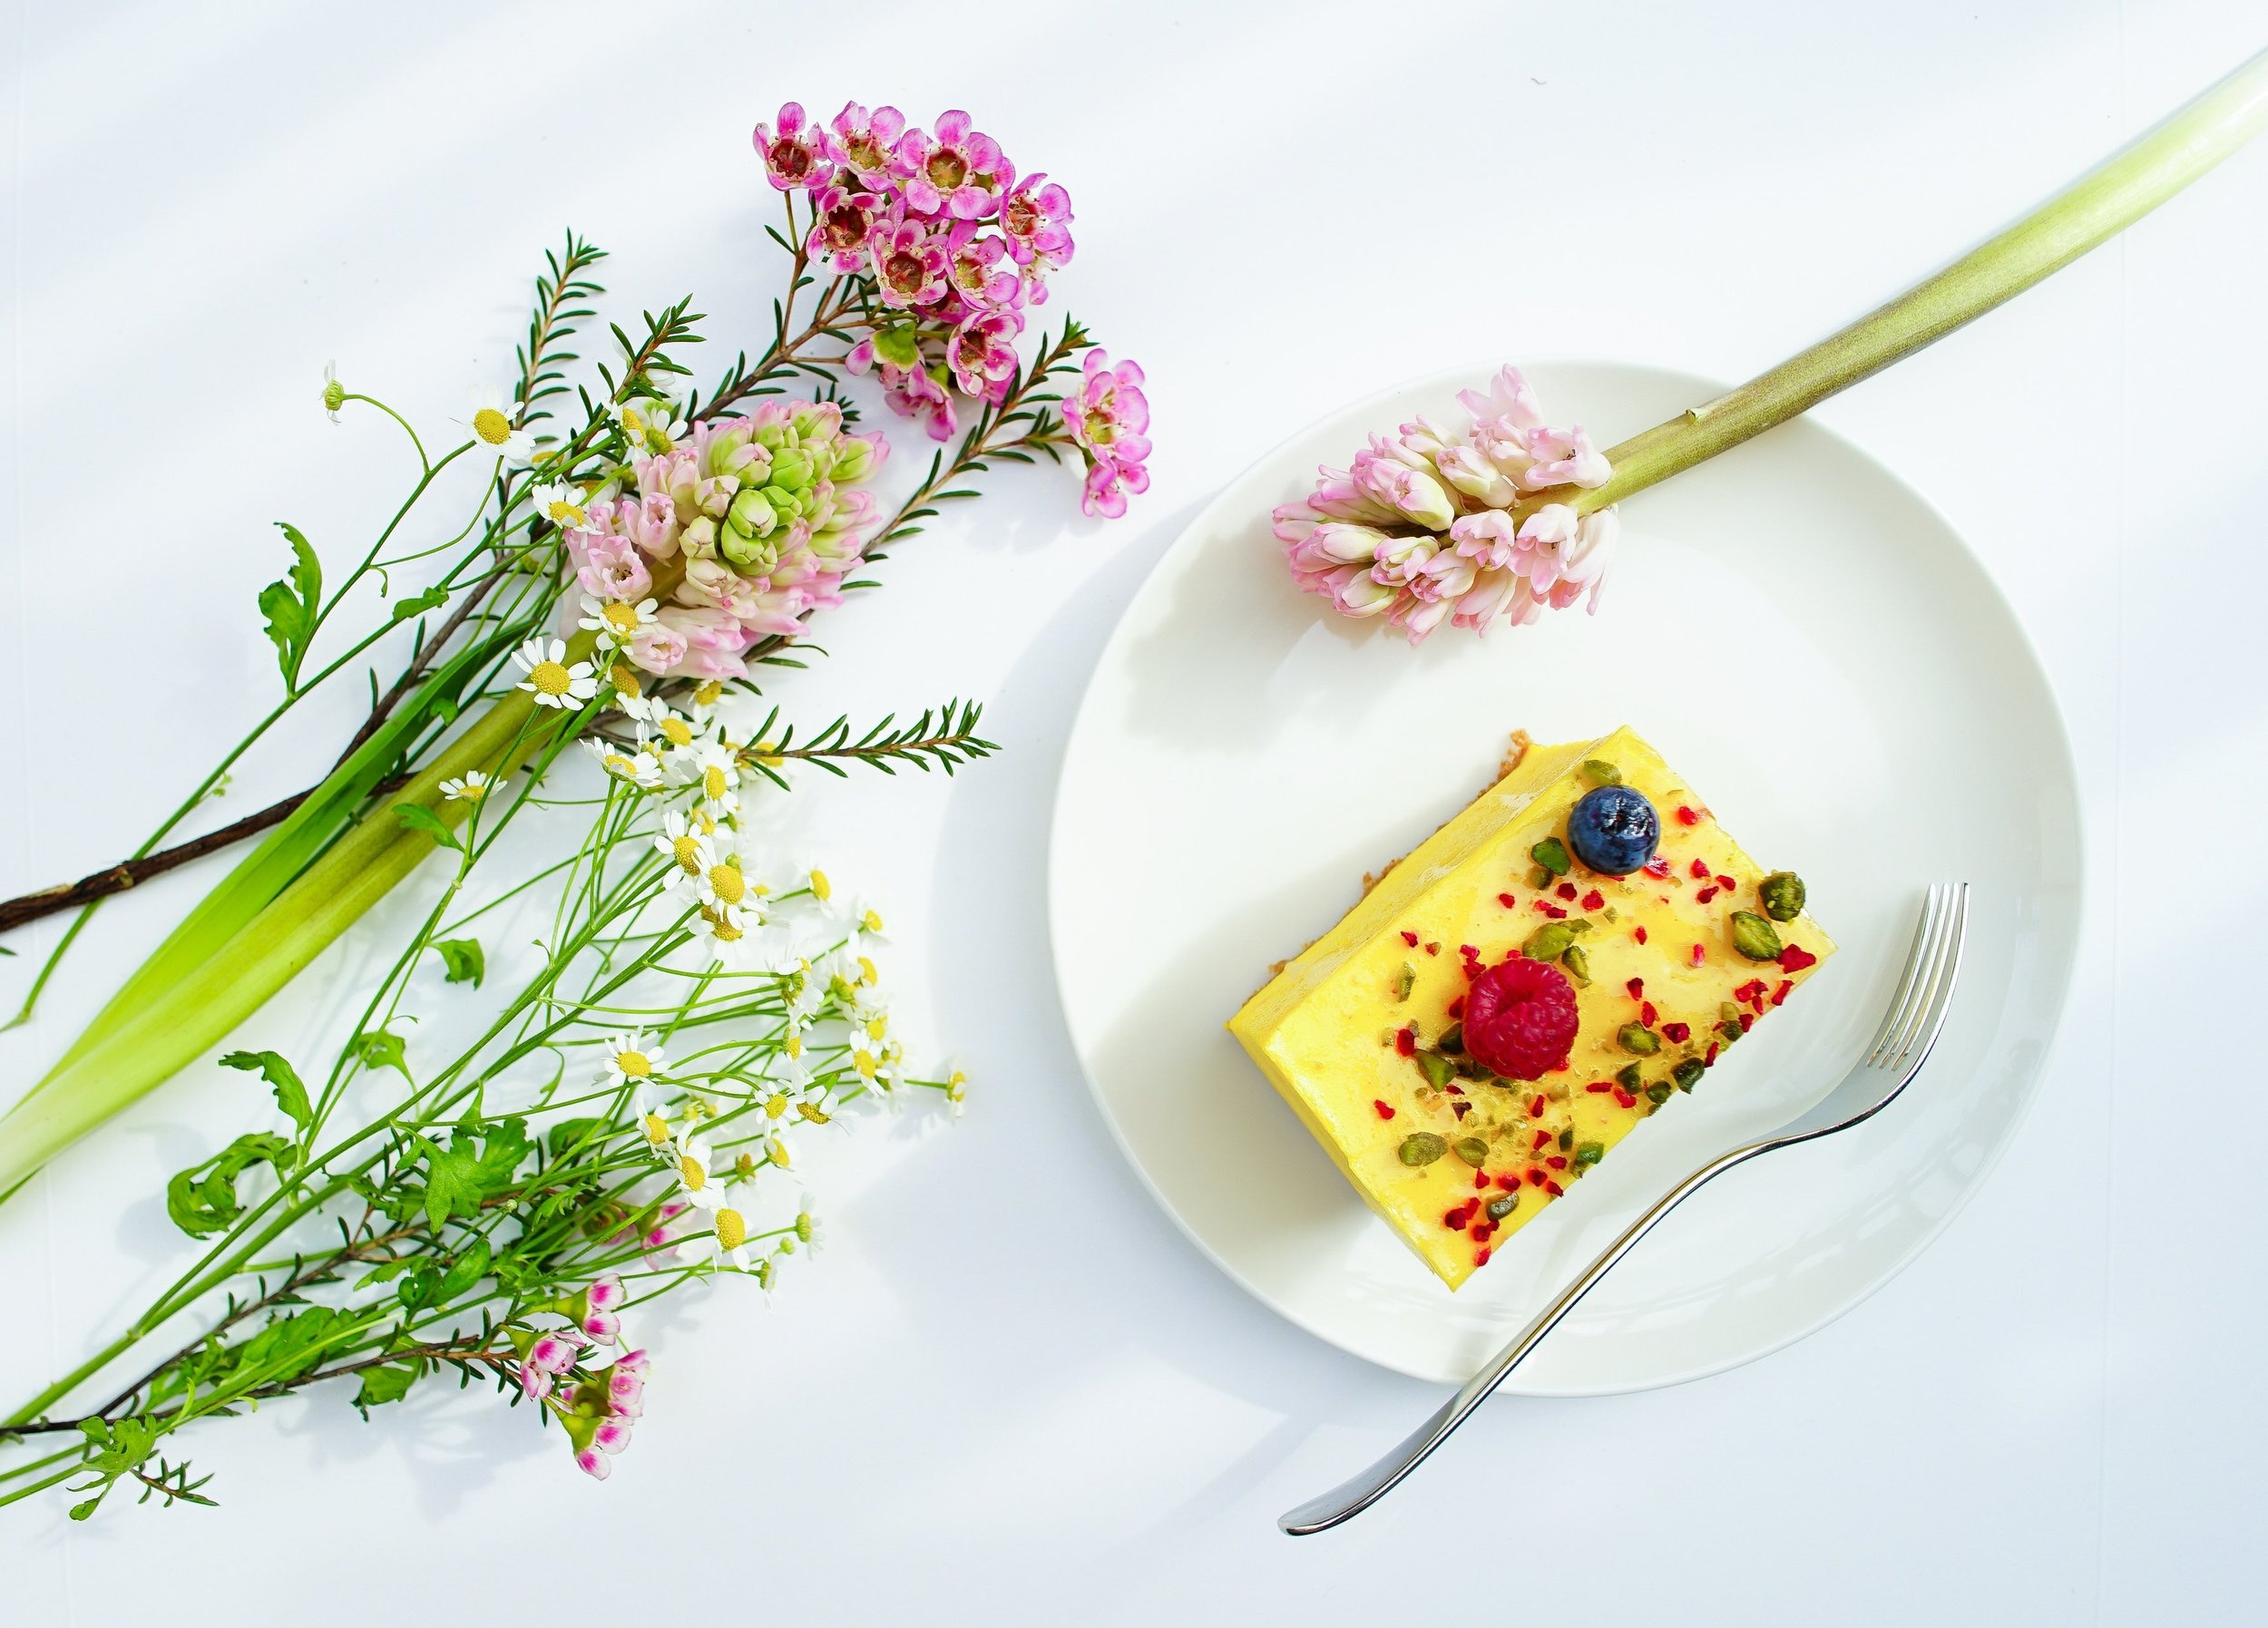 professional food photographers